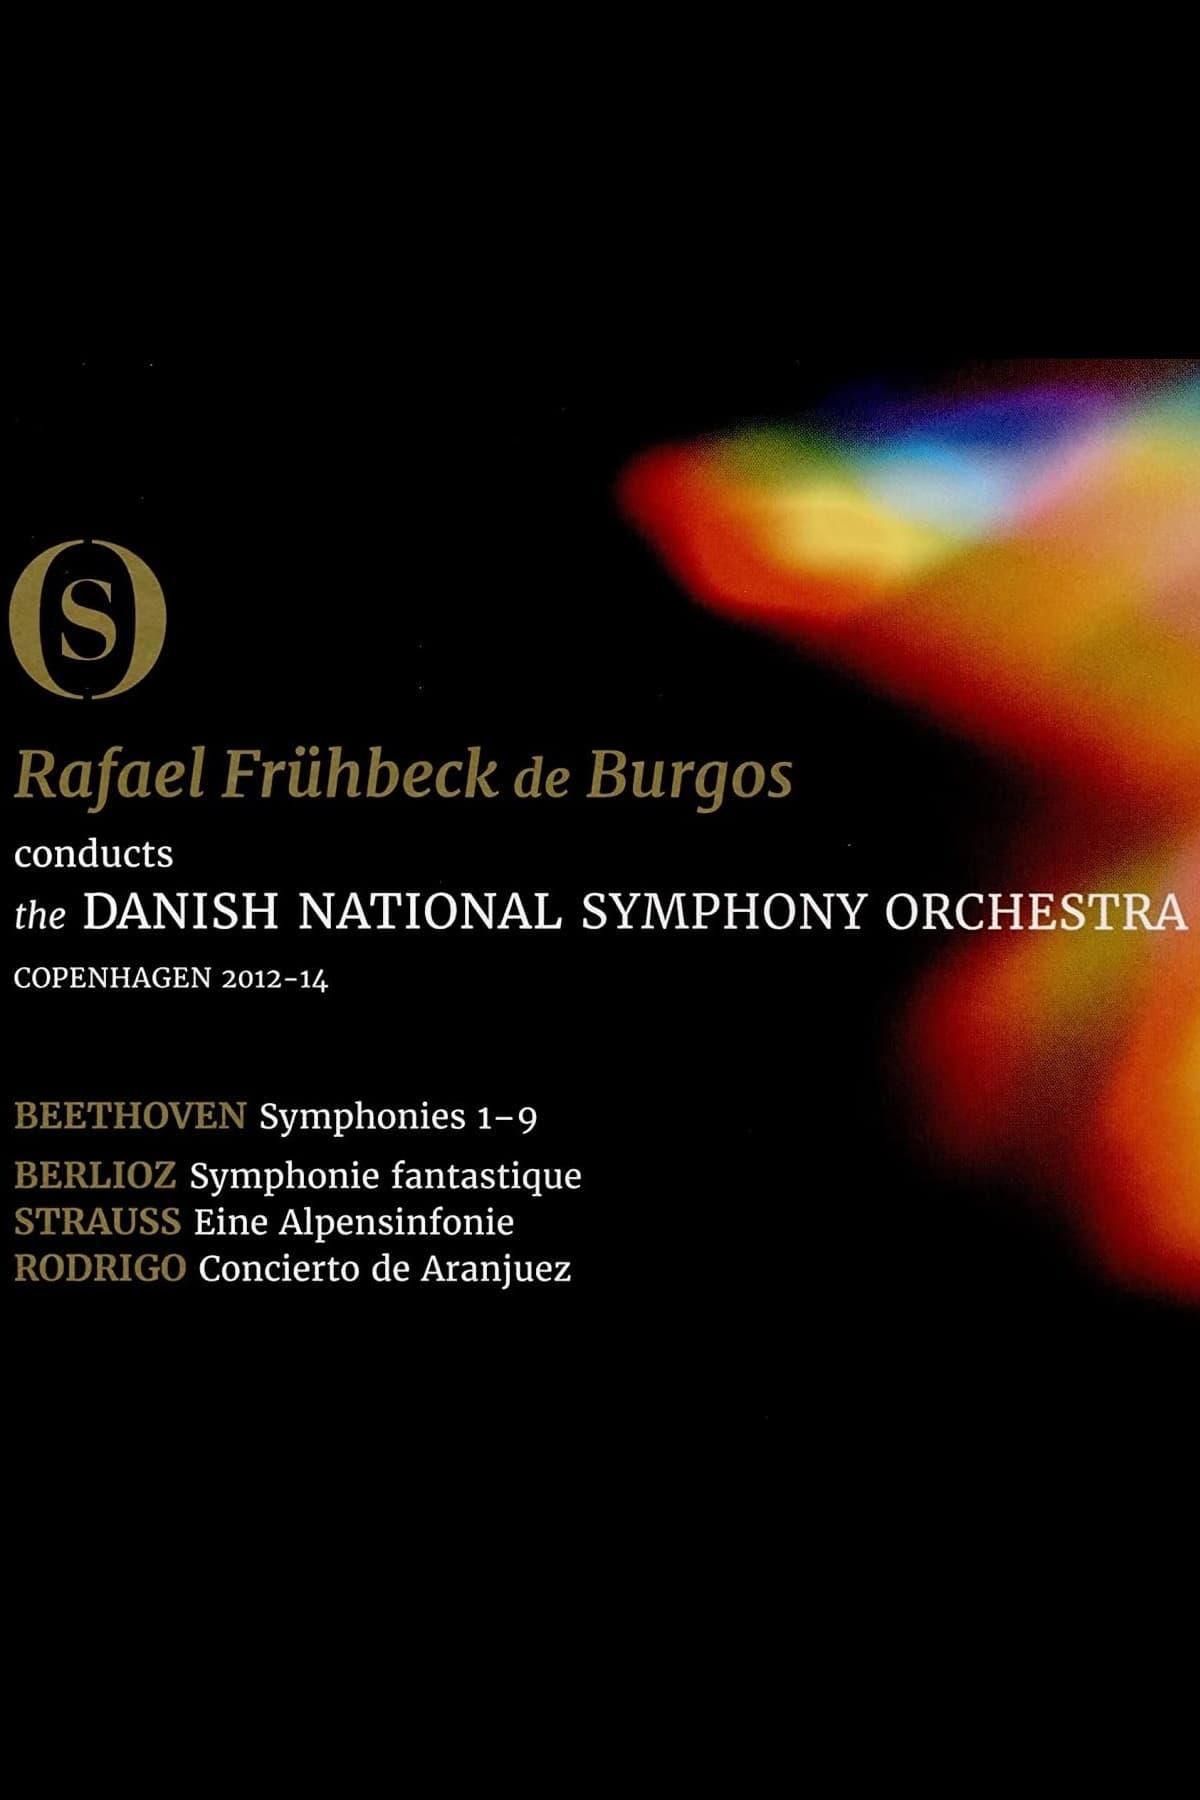 Rafael Frühbeck De Burgos, Danish National Symphony Orchestra – Ludwig van Beethoven The Symphonies